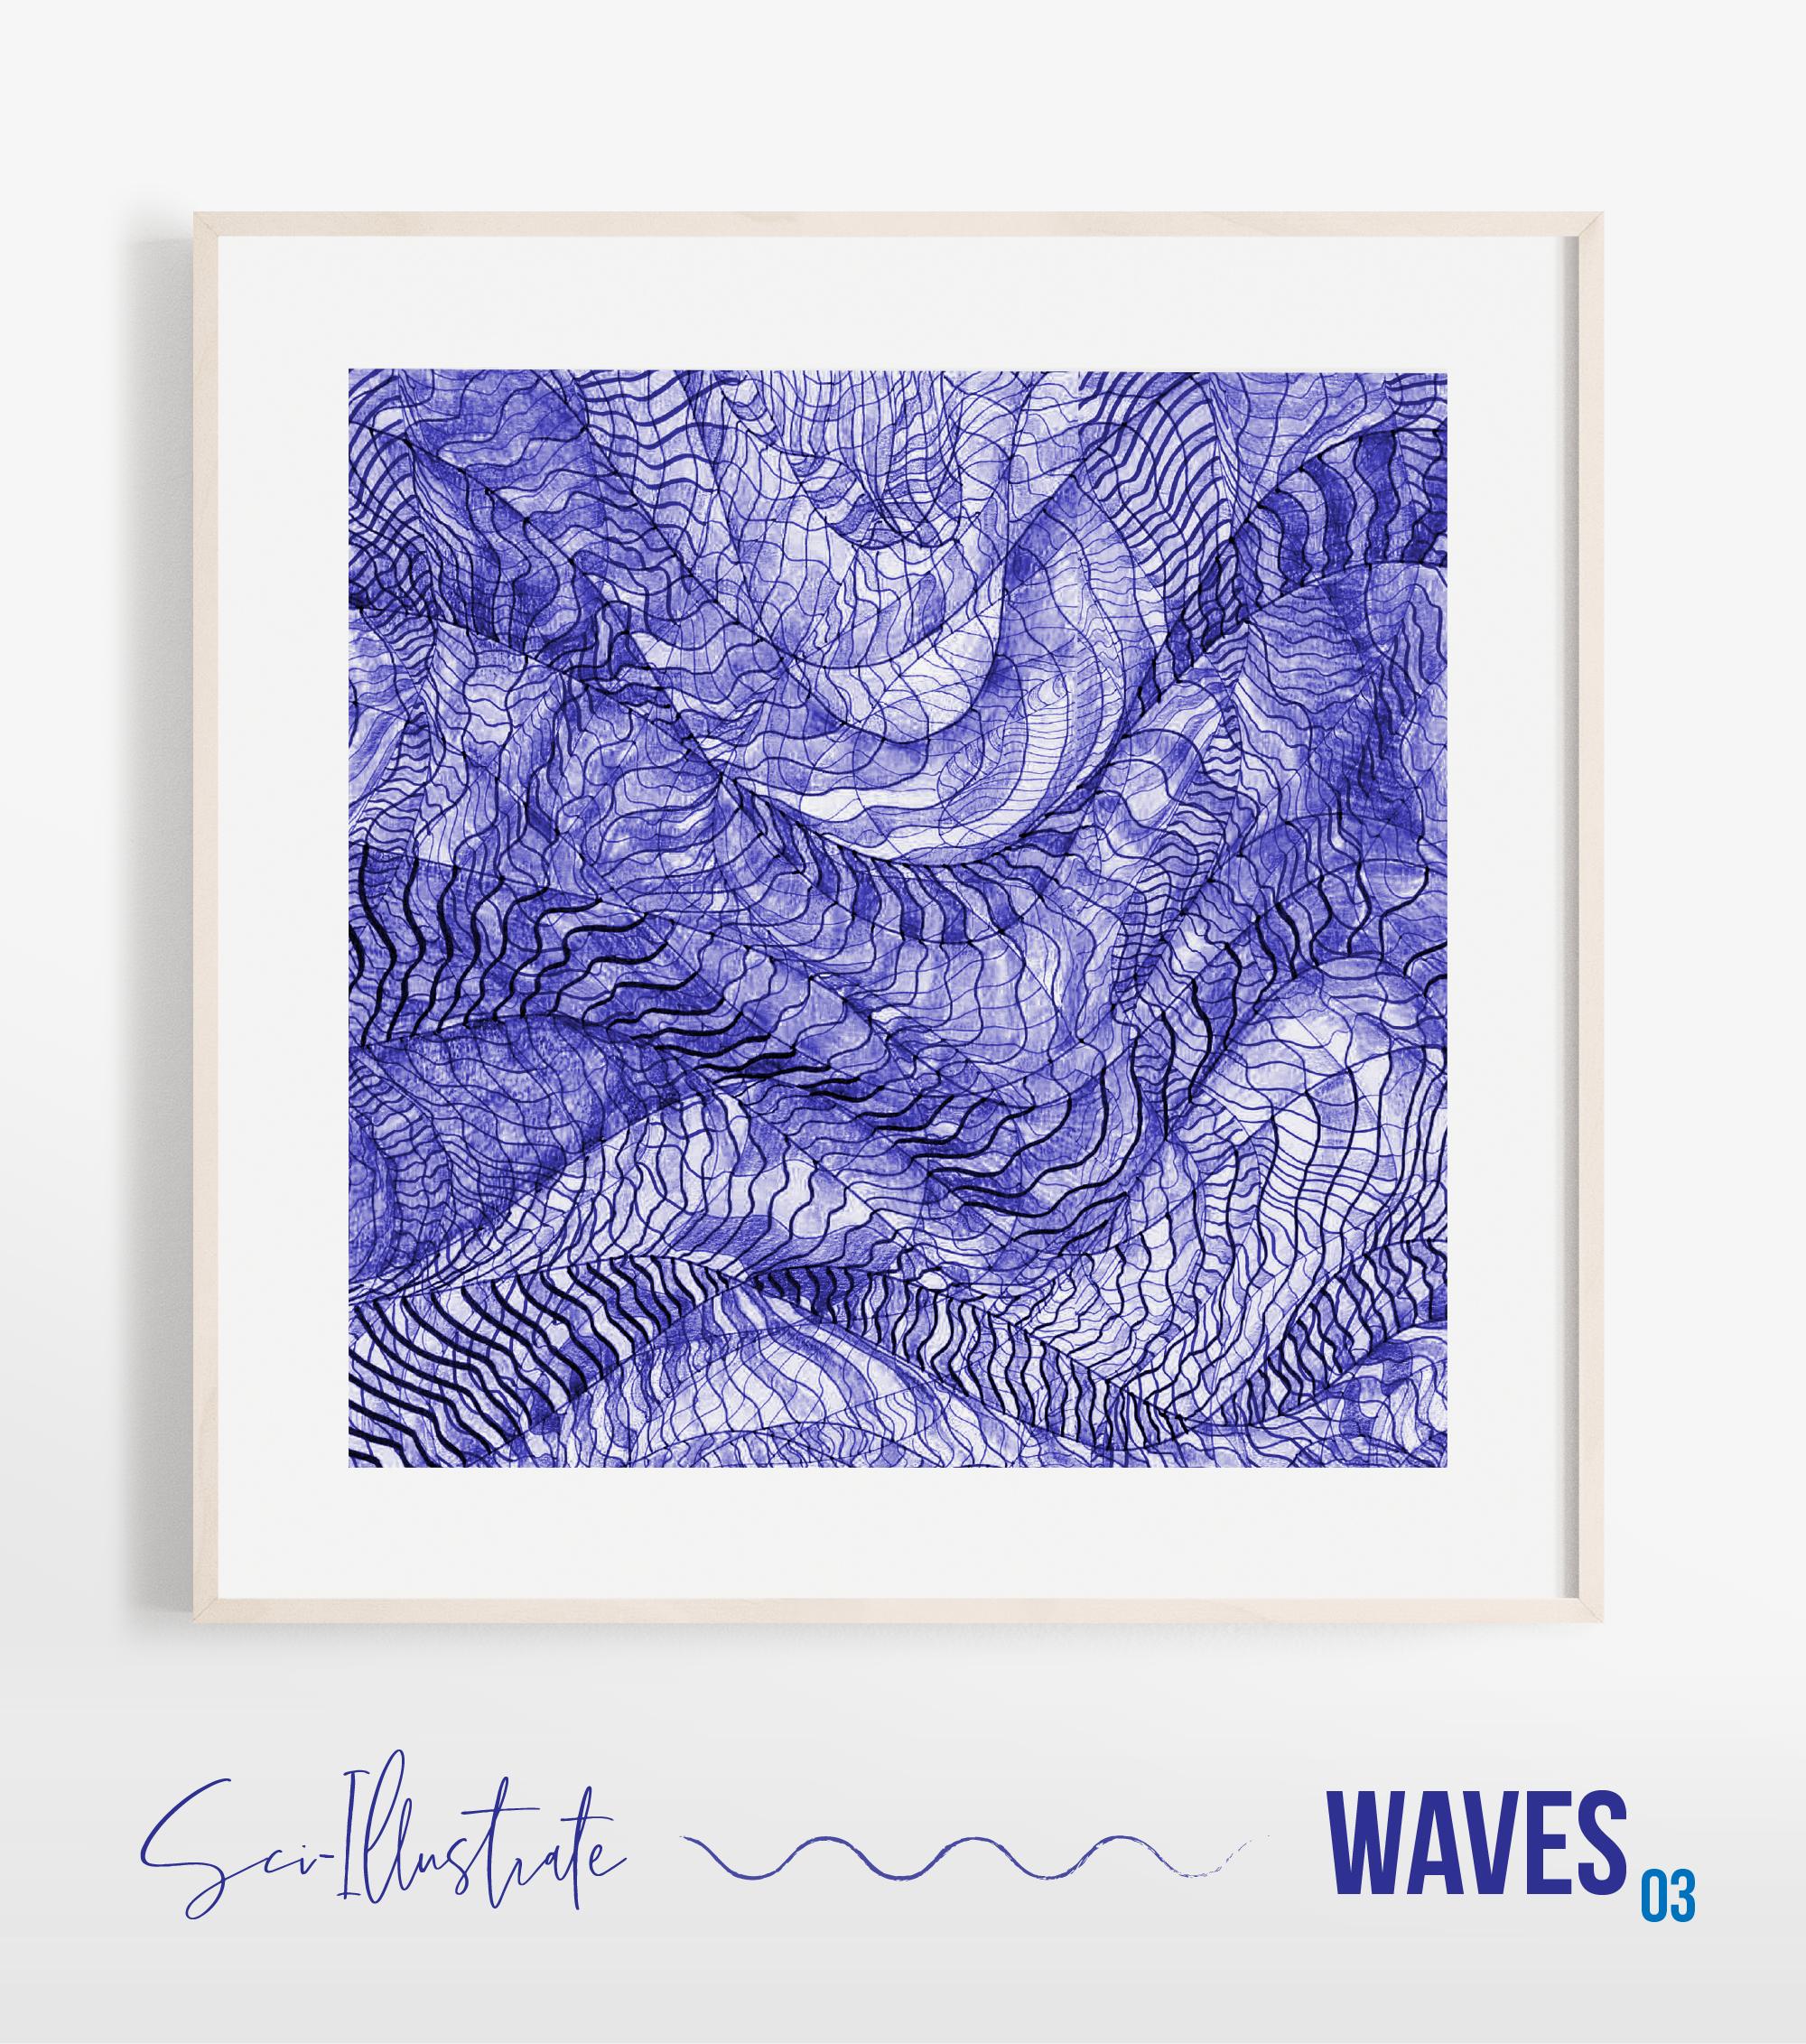 Sci-illustrate waves-03-01.png